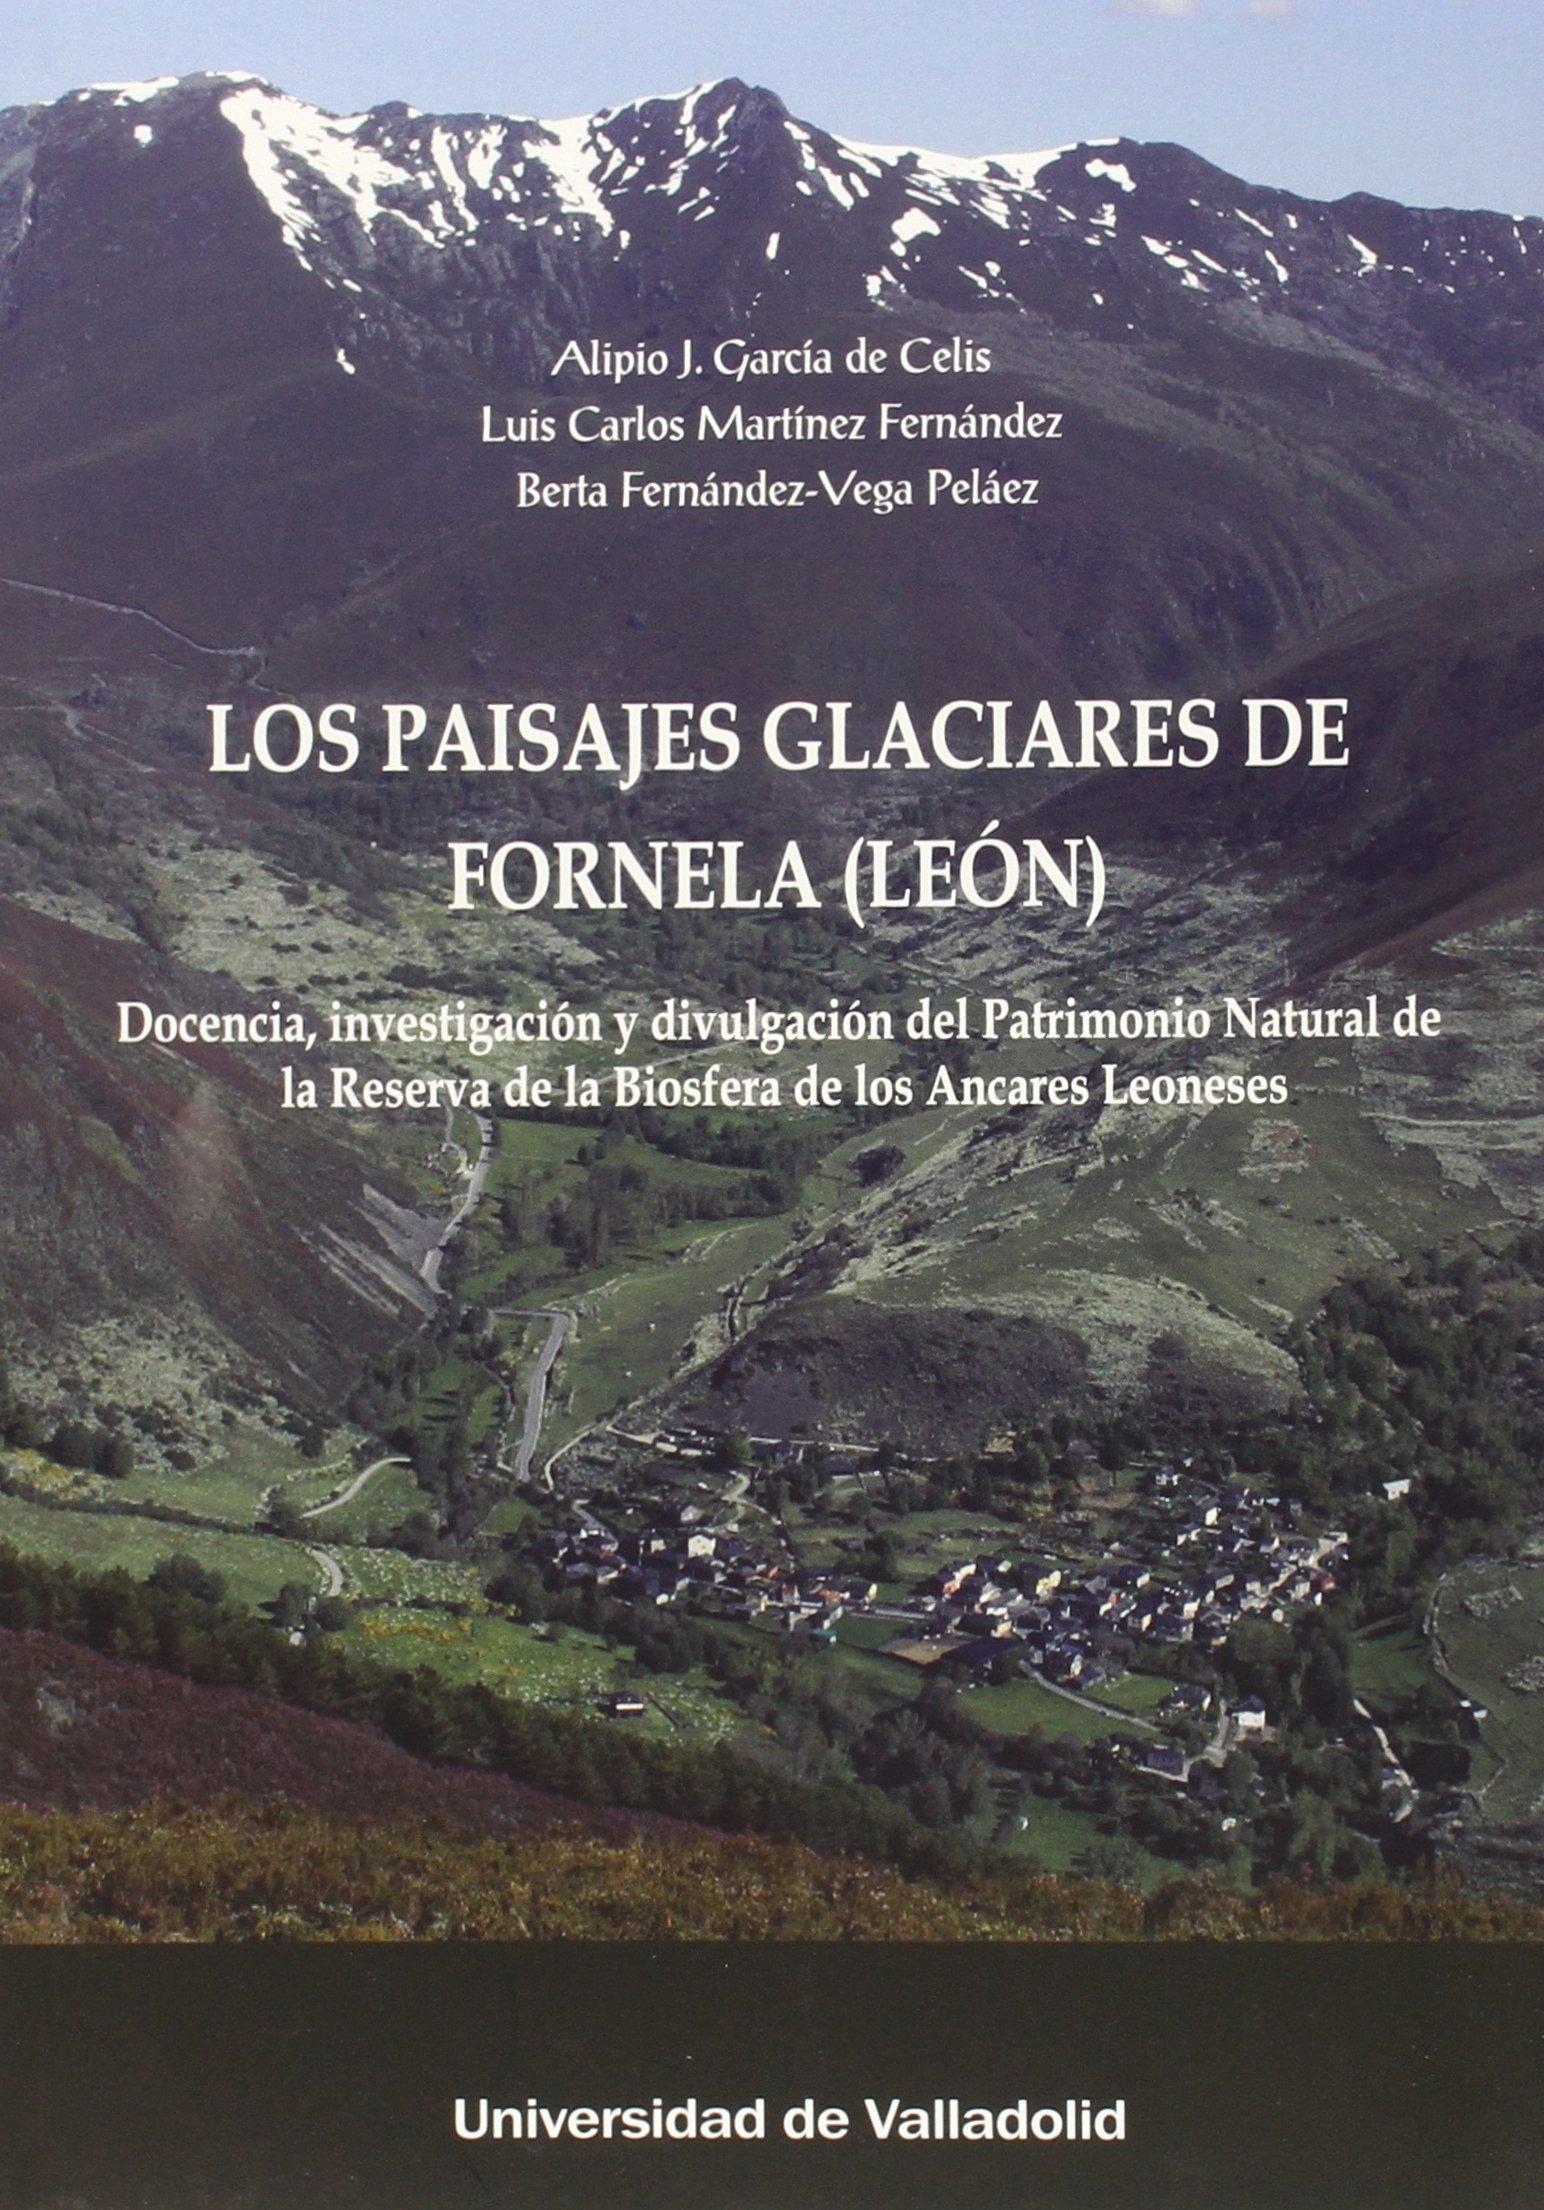 Paisajes Glacciares De Fornela (León): Amazon.es: GARCIA DE CELIS, ALIPIO JOSE, MARTINEZ FERNANDEZ, LUIS CARLOS, FERNANDEZ-VEGA PELAEZ, BERTA: Libros